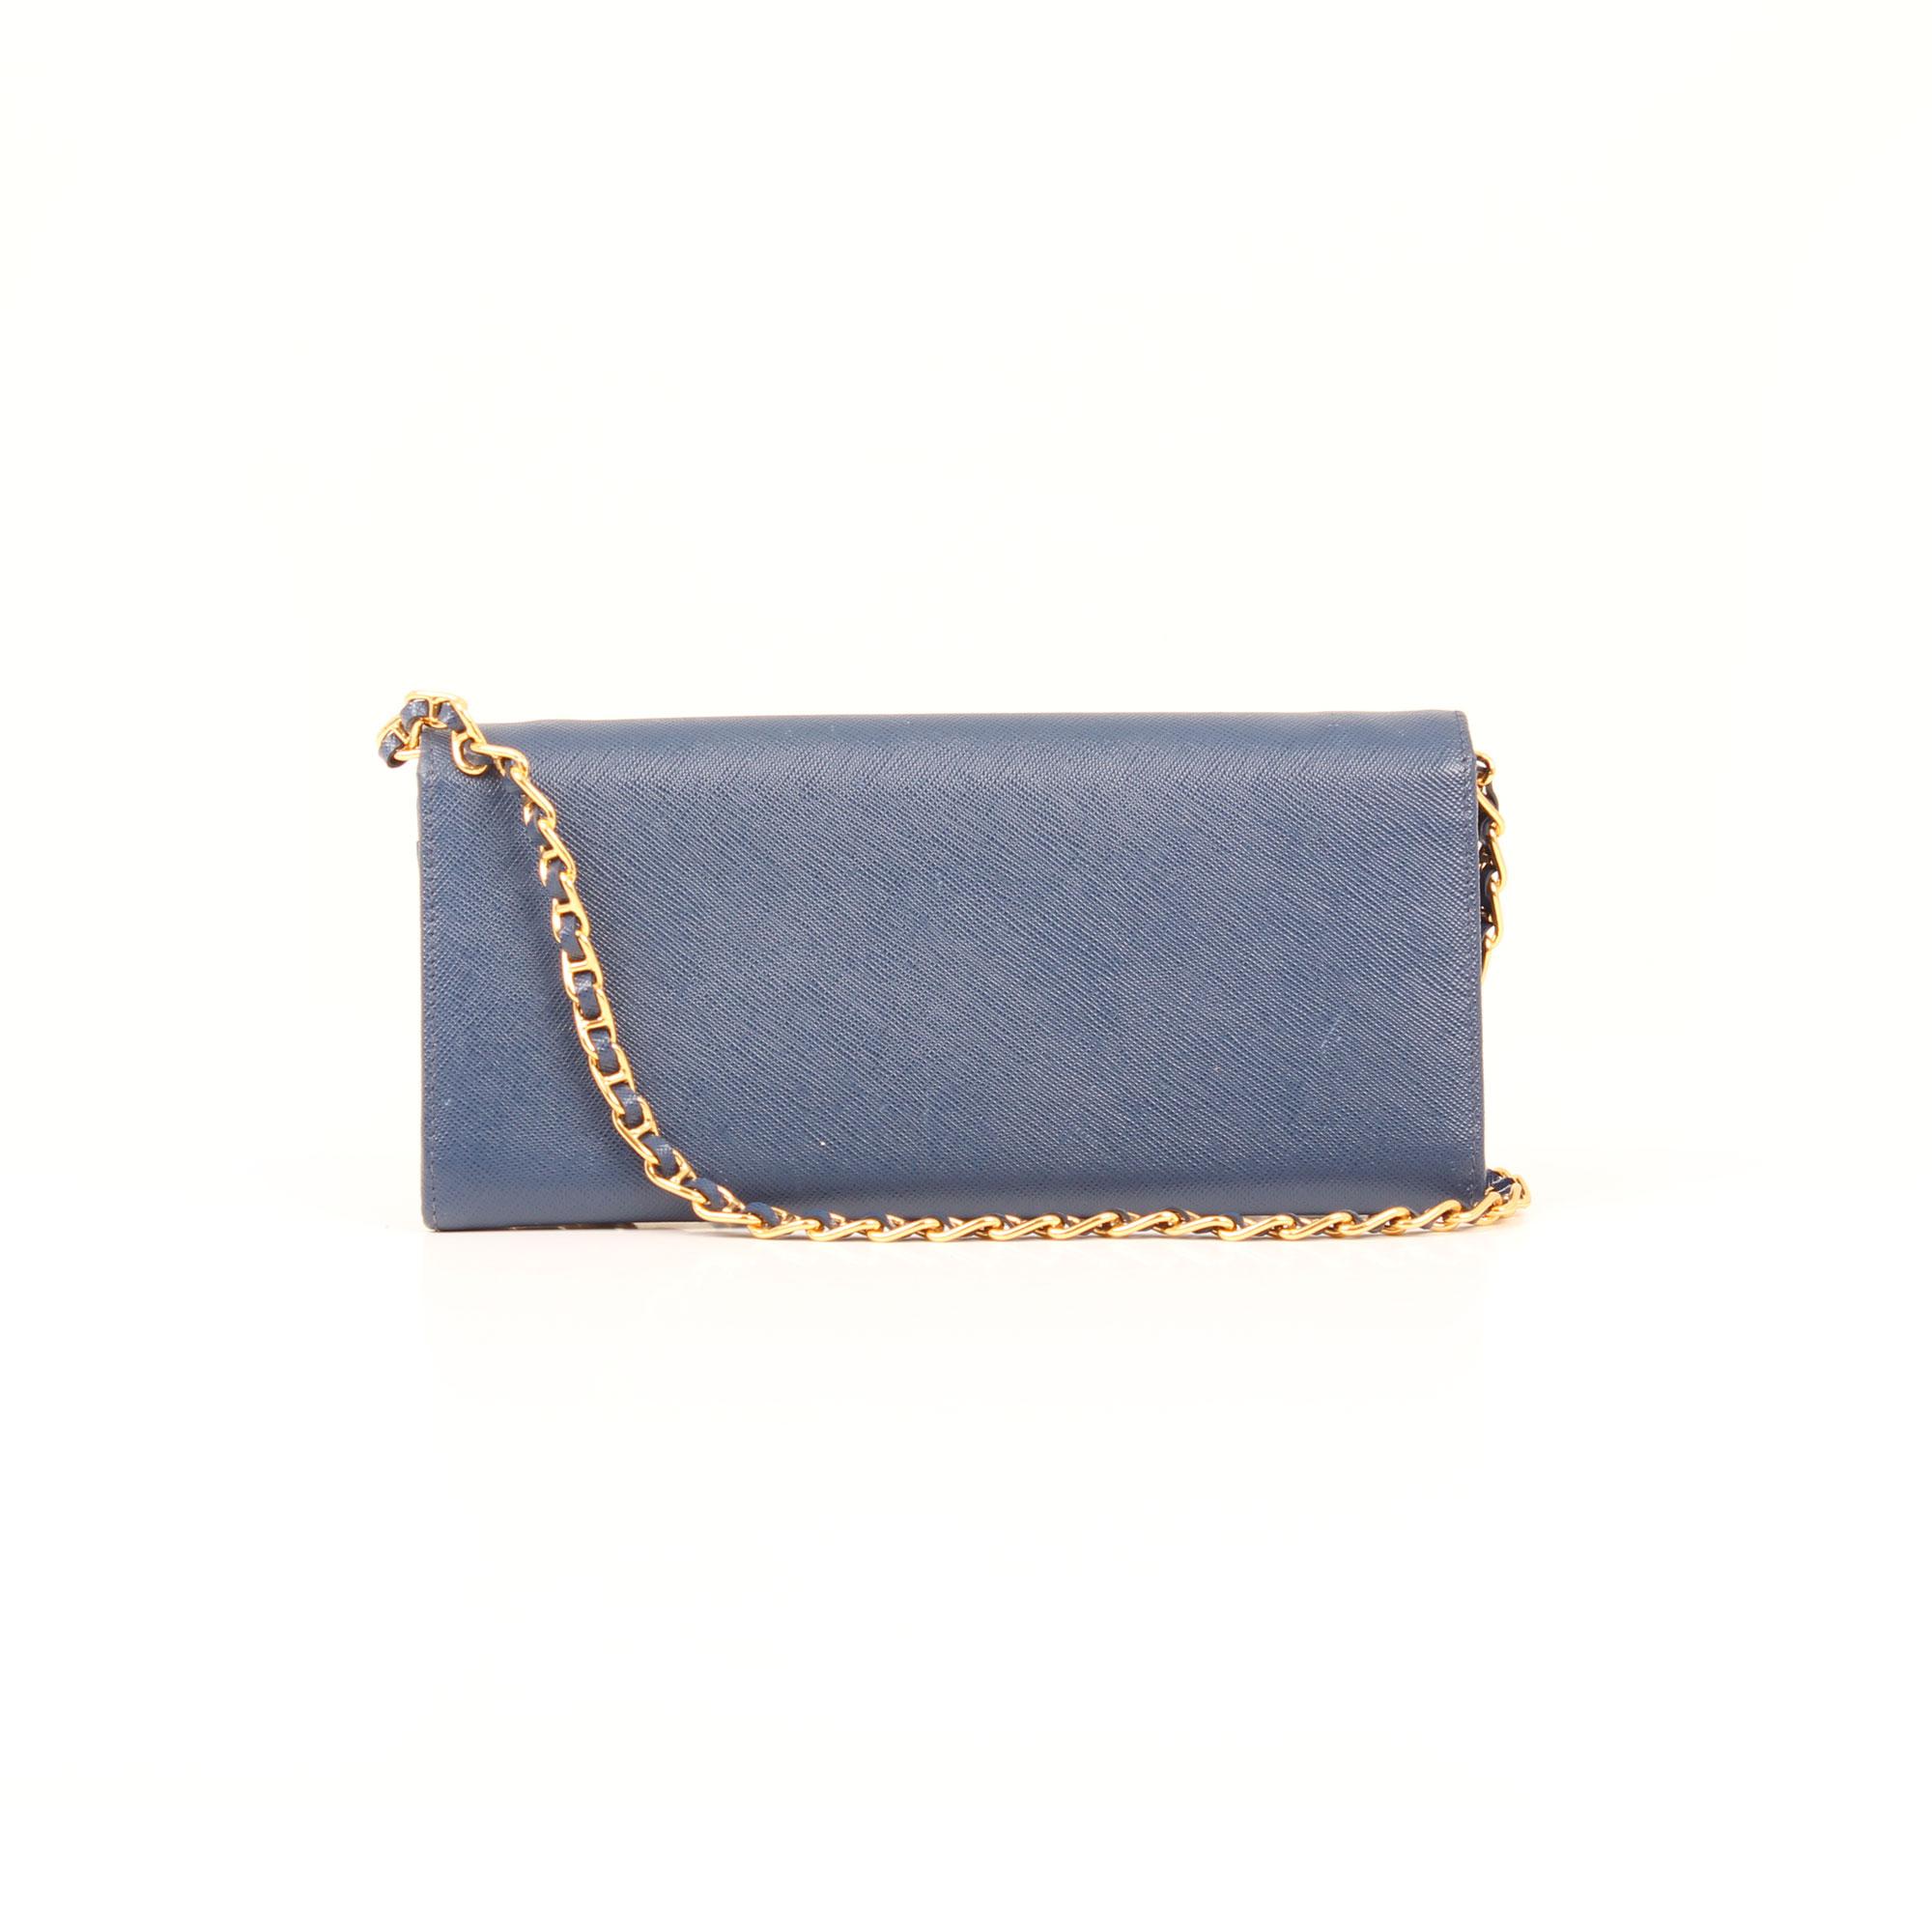 bag-prada-wallet-on-chain-saffiano-metal-bluette-blue-back